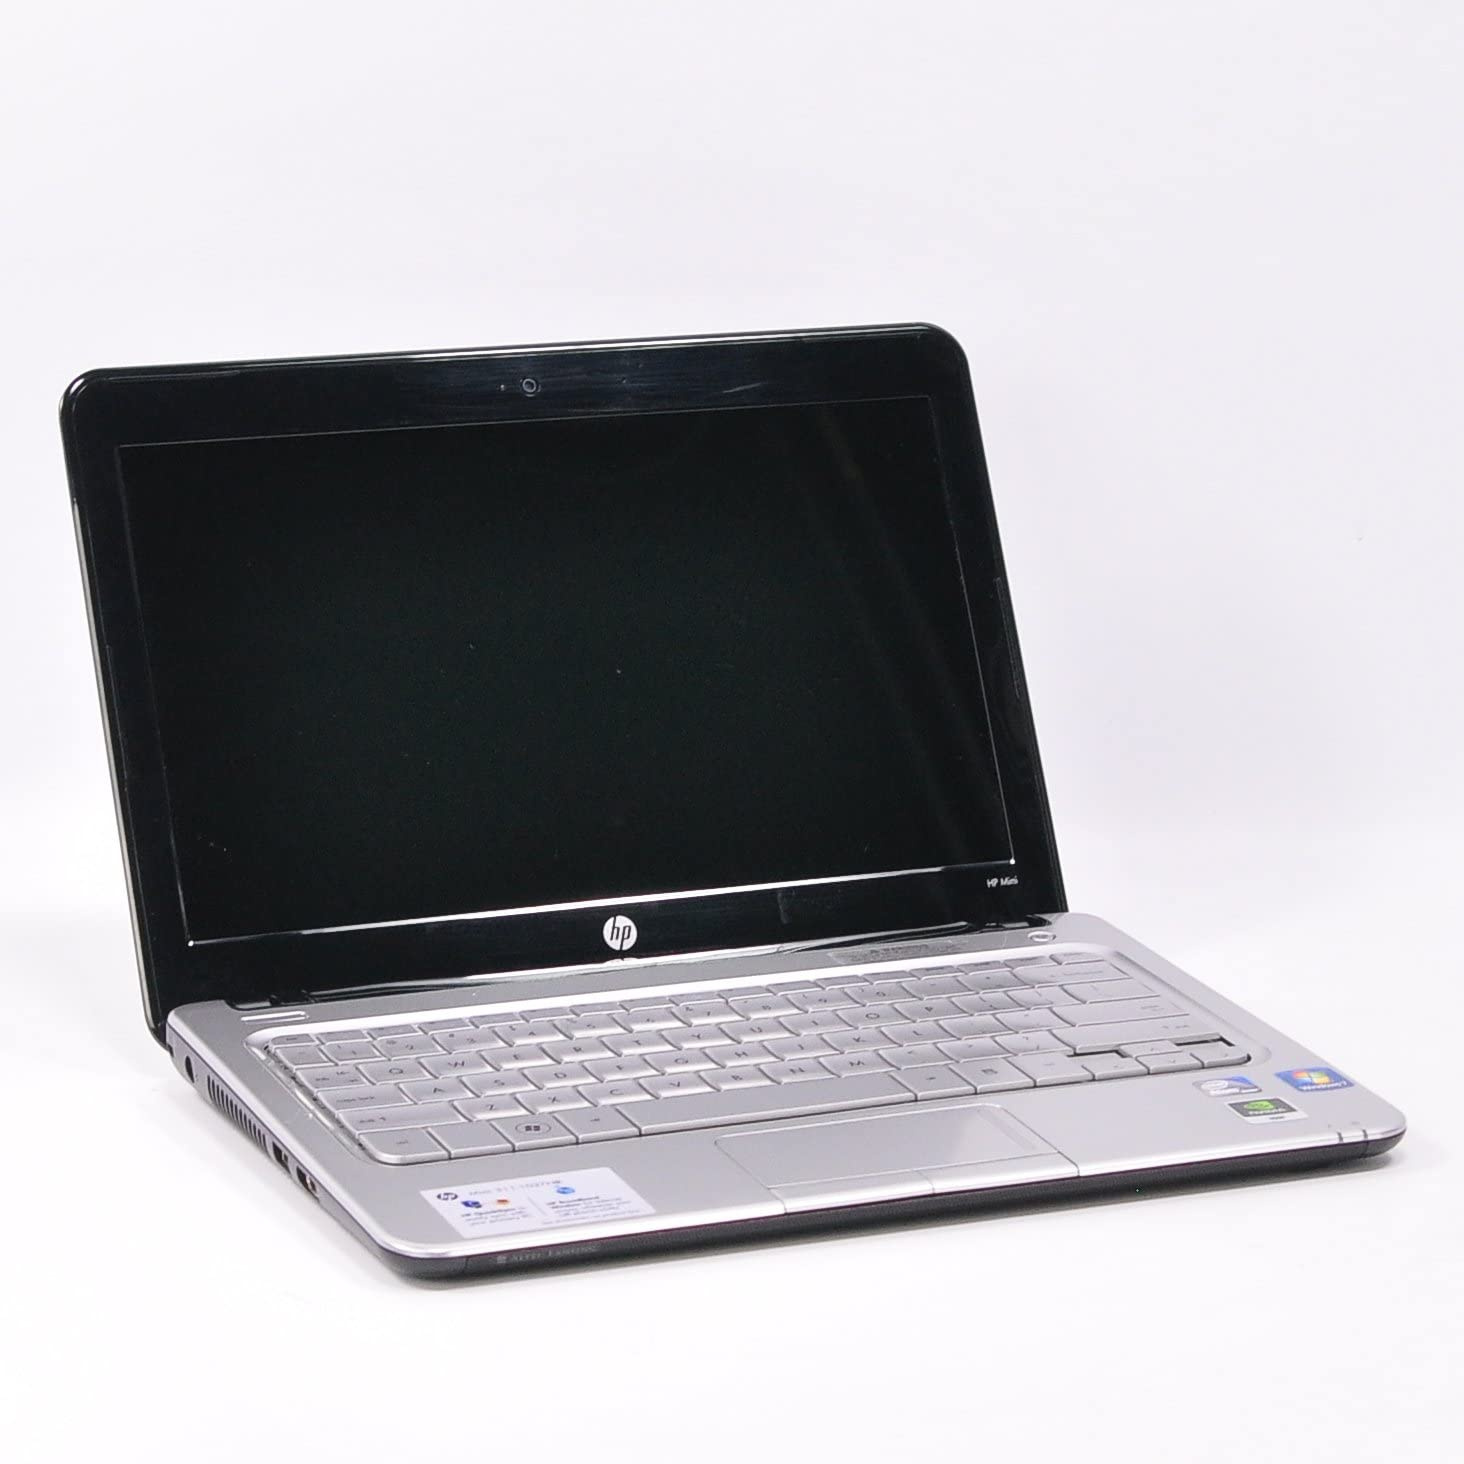 "Hp Mini 311-1037nr Laptop Netbook 11.6"" HD Screen 2Gig Ram 160Gig HD 1.6Ghz Intel Atom WebCam"